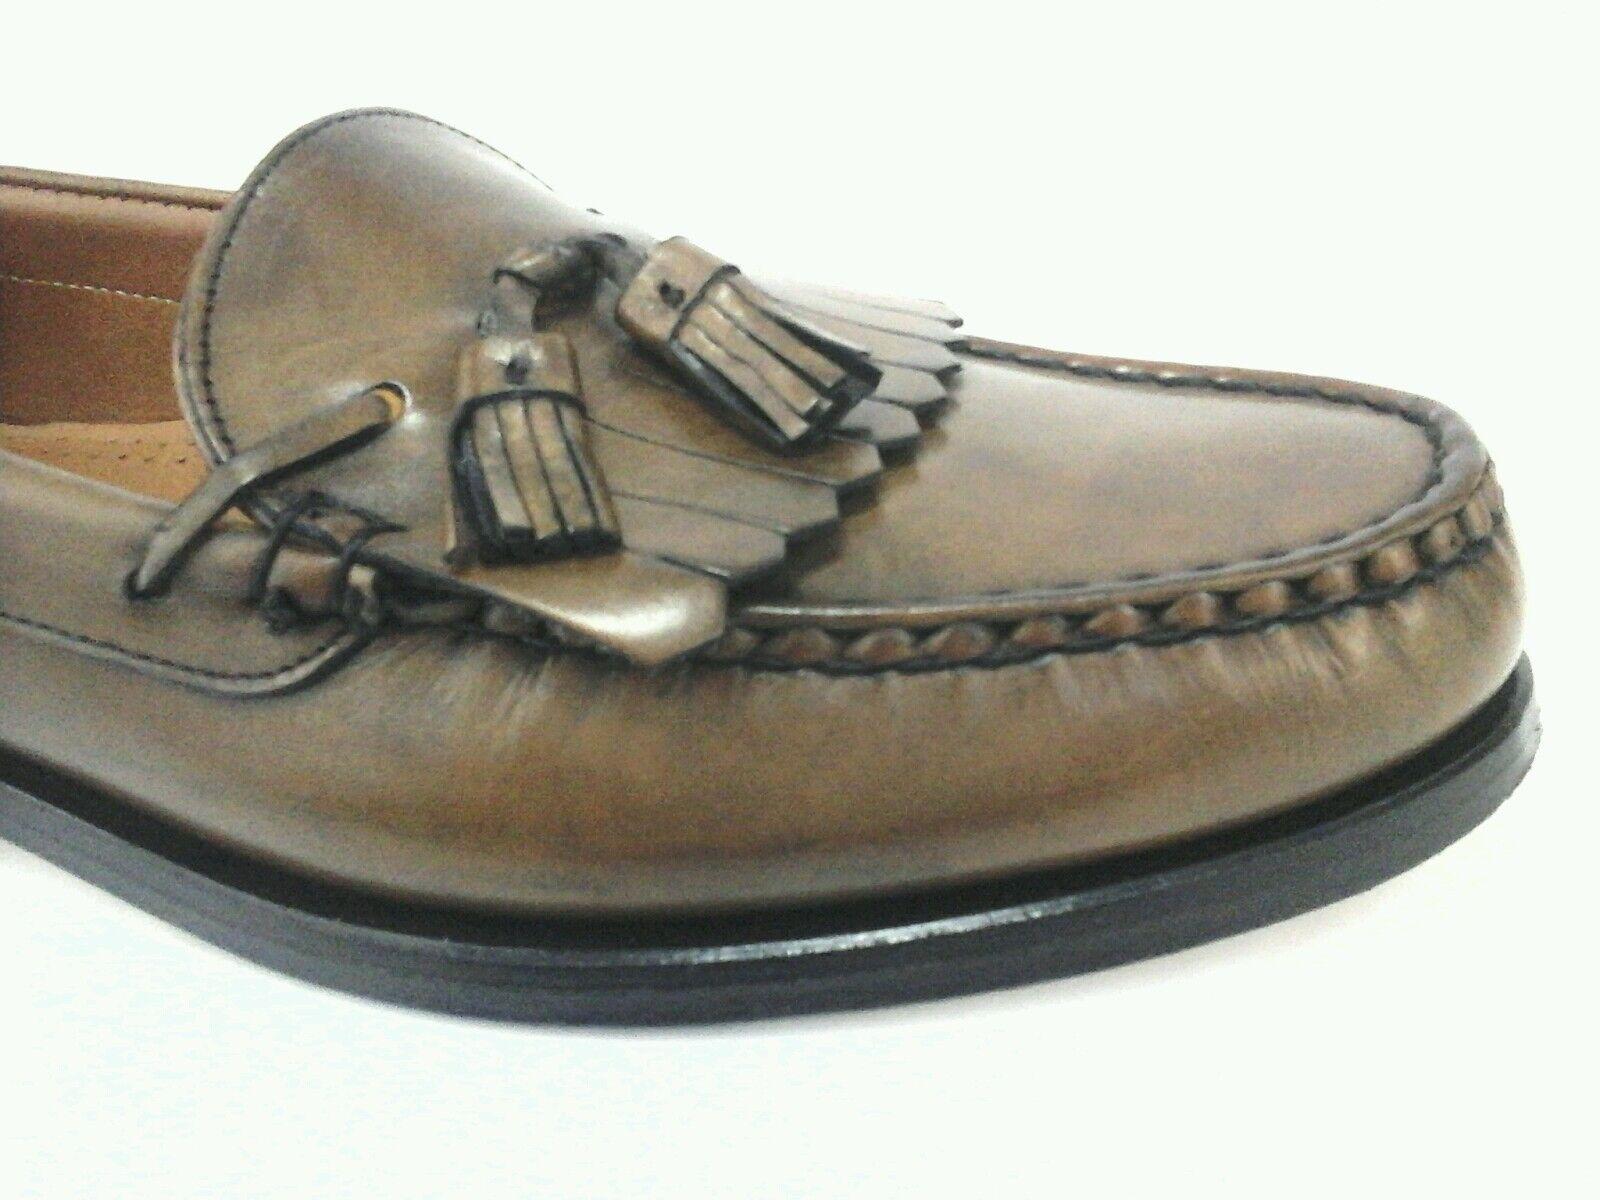 Allen Edmonds Lowry H Mens Brown Leather Kiltie Tassel Slip On shoes US 11 EU 44